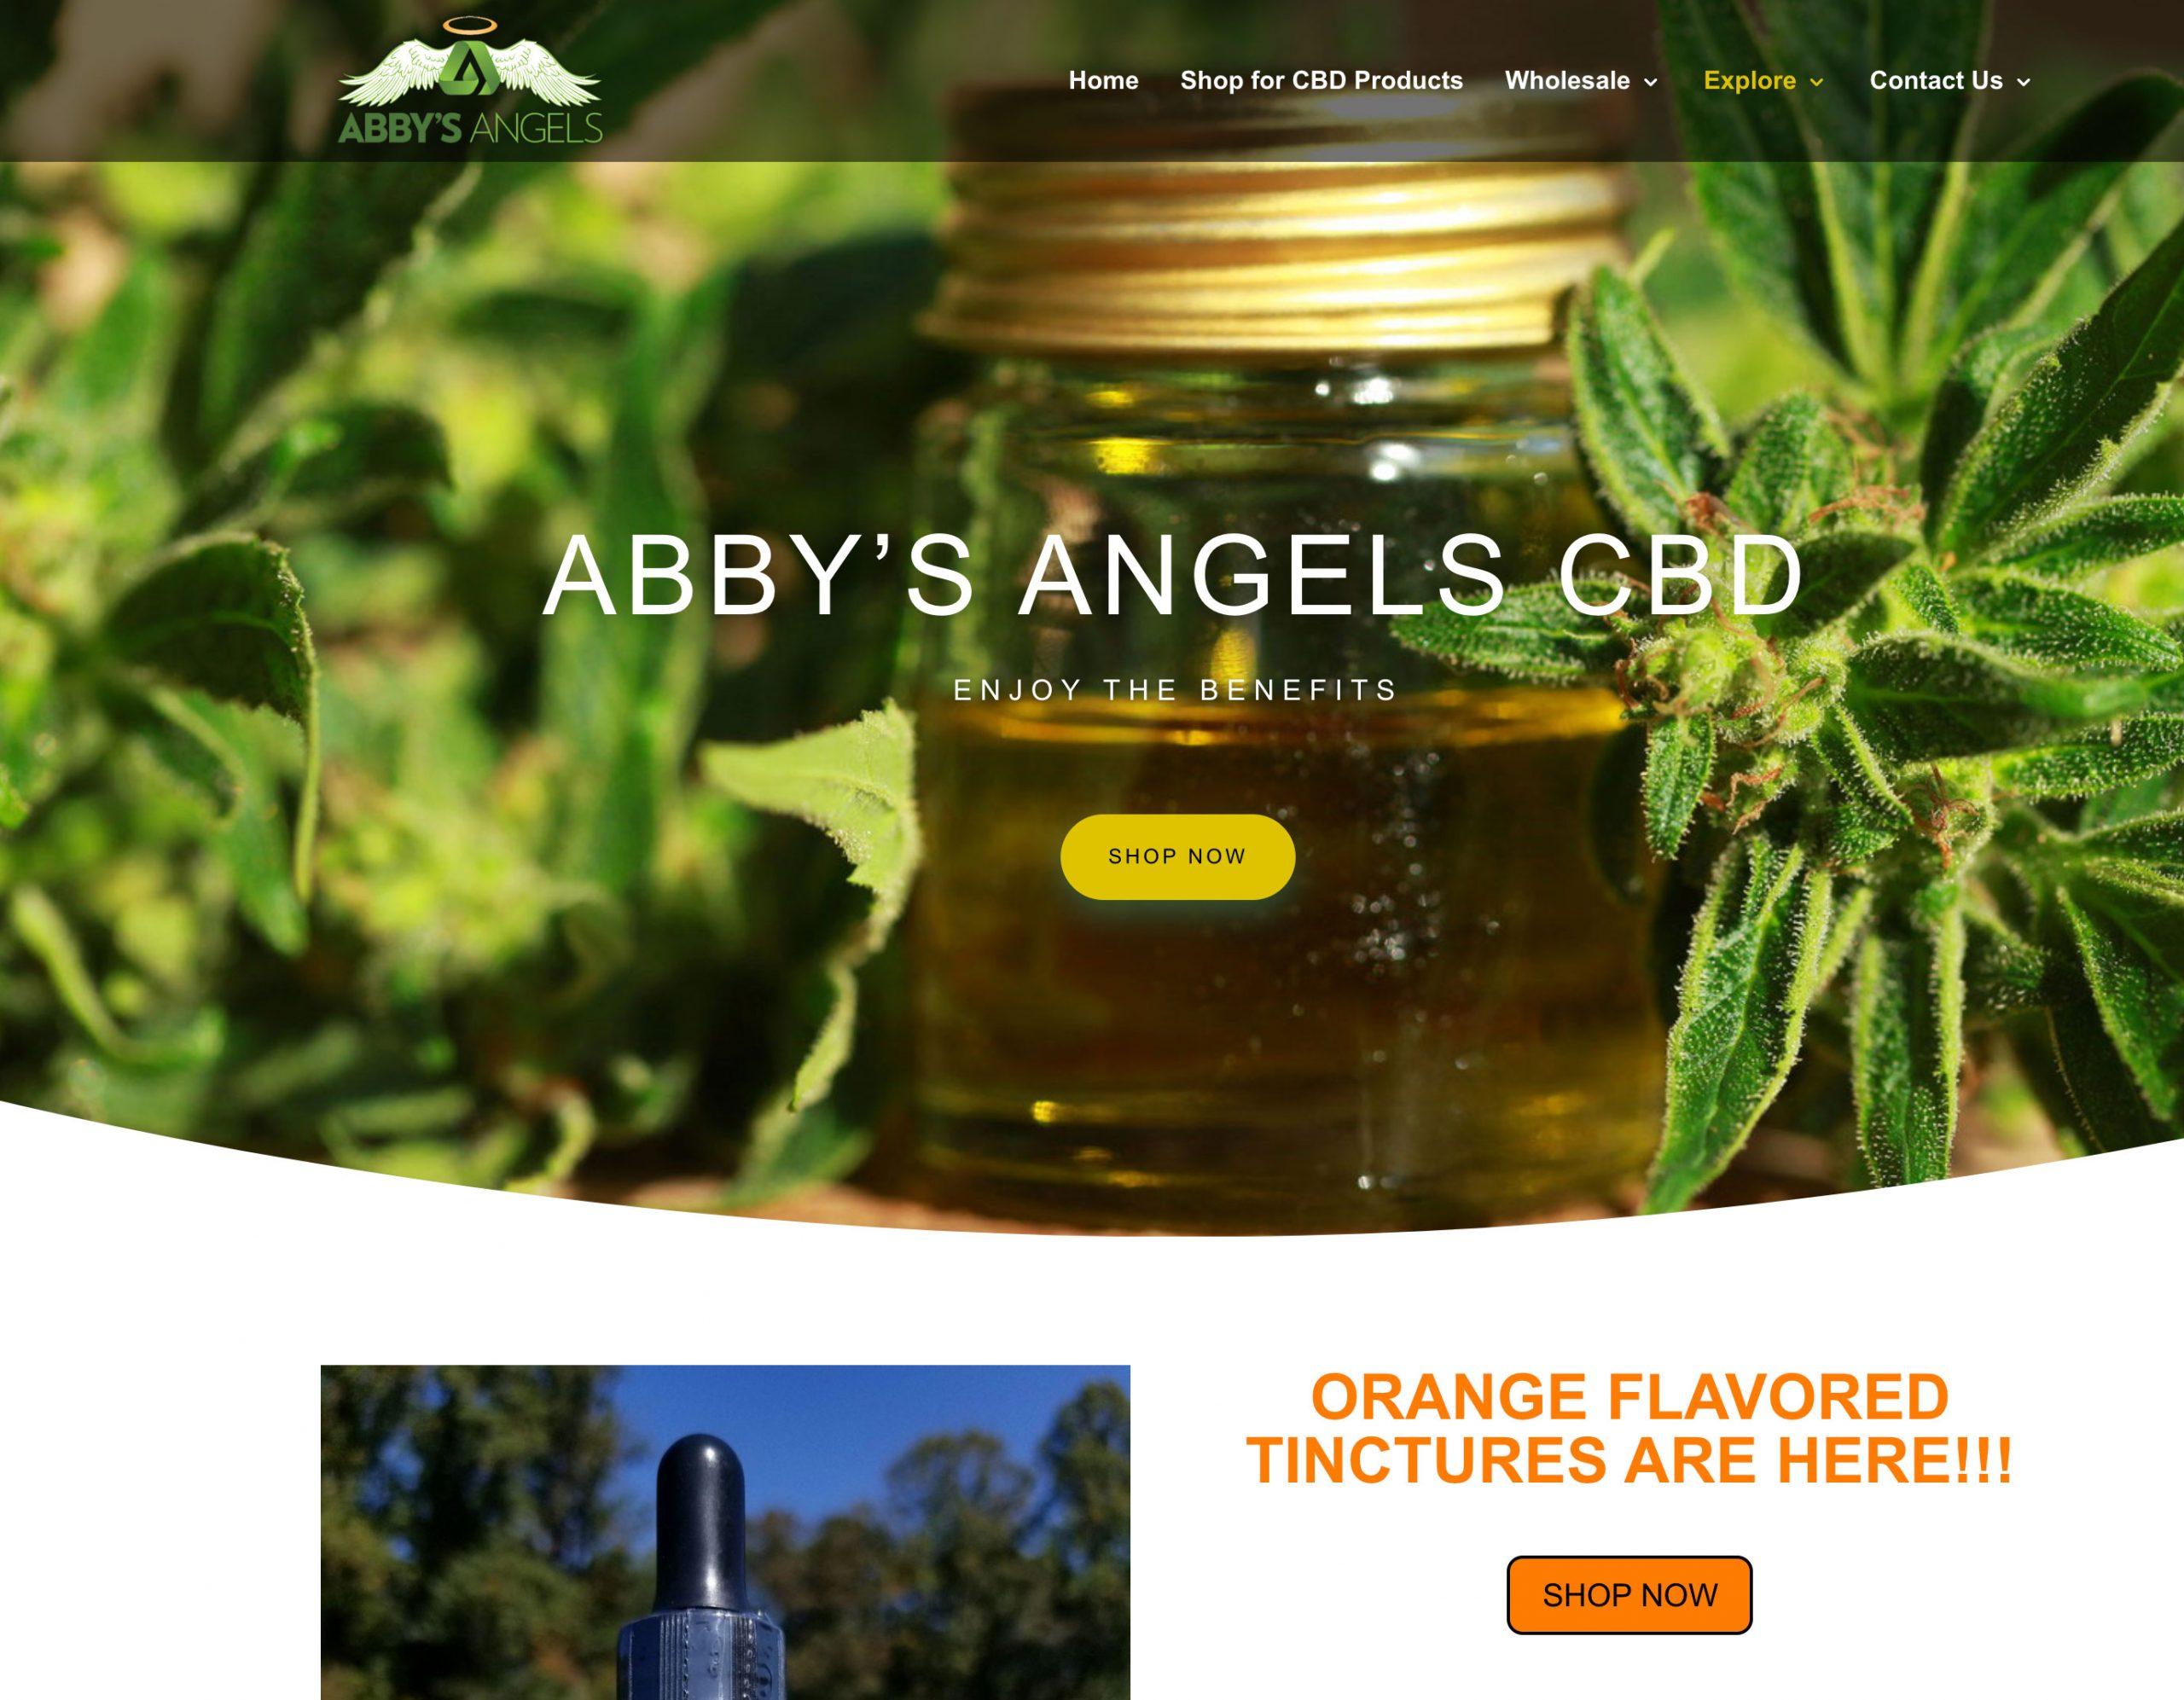 abbys angels CBD